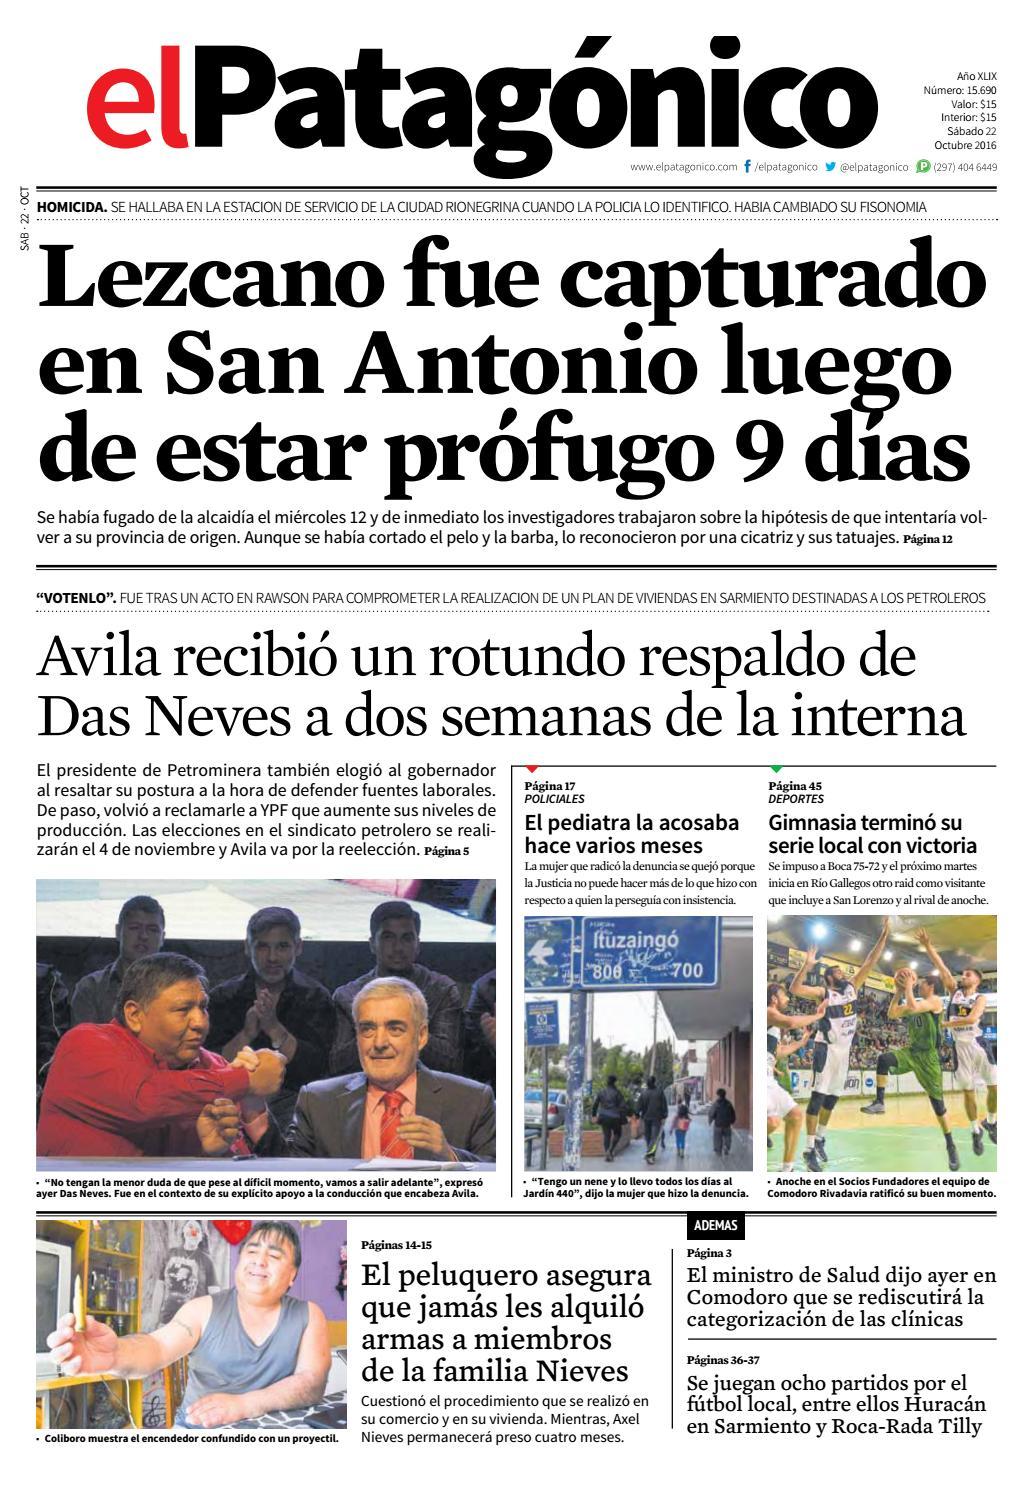 edicion000722102016.pdf by El Patagonico - issuu